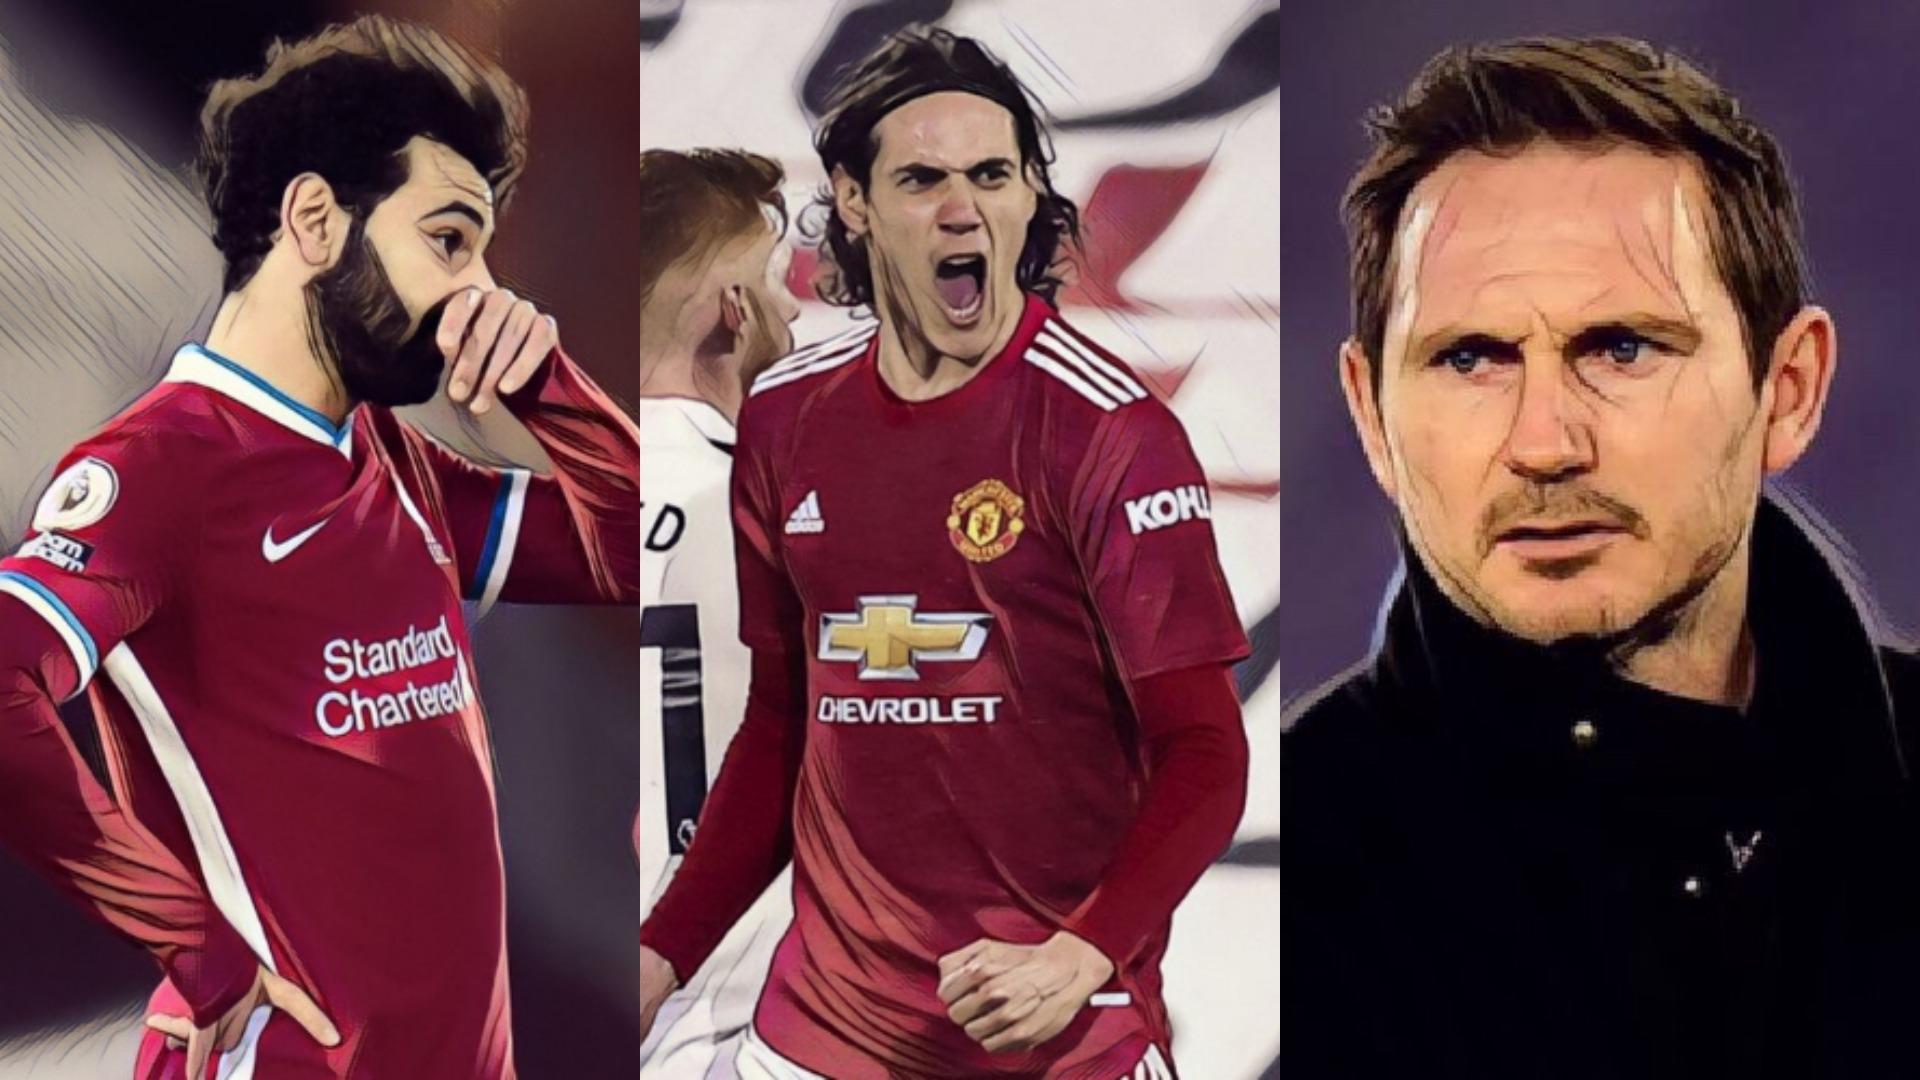 Premier-league-weekly-awards-liverpool-man-utd-chelsea